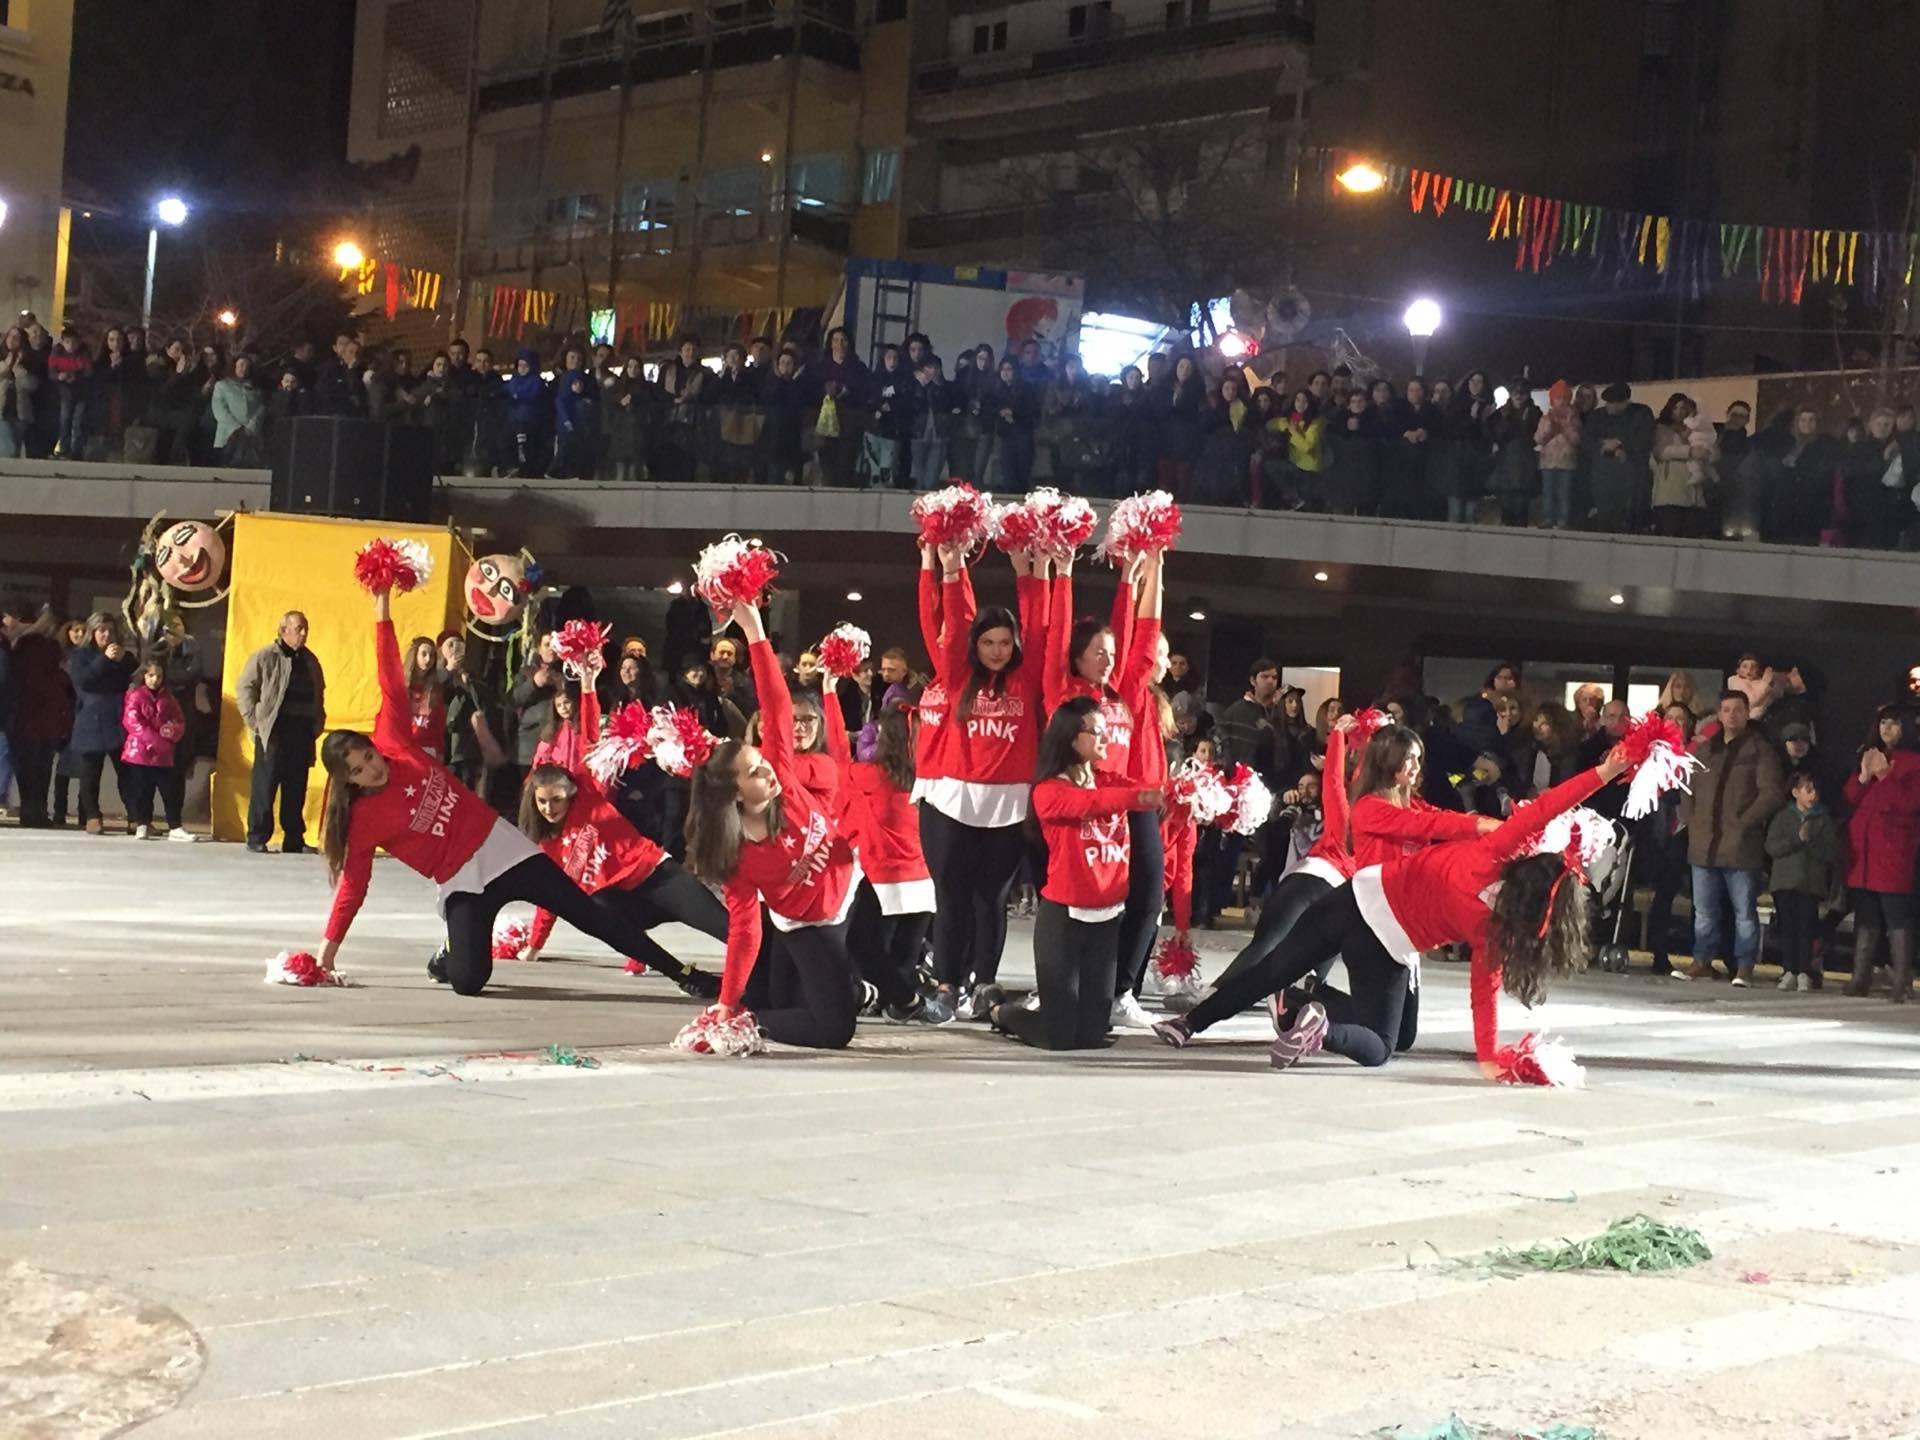 kozan.gr: Κεντρική πλατεία: Eντυπωσίασαν με τους μοντέρνους χορούς (Σάλσα, Τάγκο, latin κ.α.), πολιτιστικοί & αθλητικοί σύλλογοι της Κοζάνης (100+ Φωτογραφίες & Βίντεο)